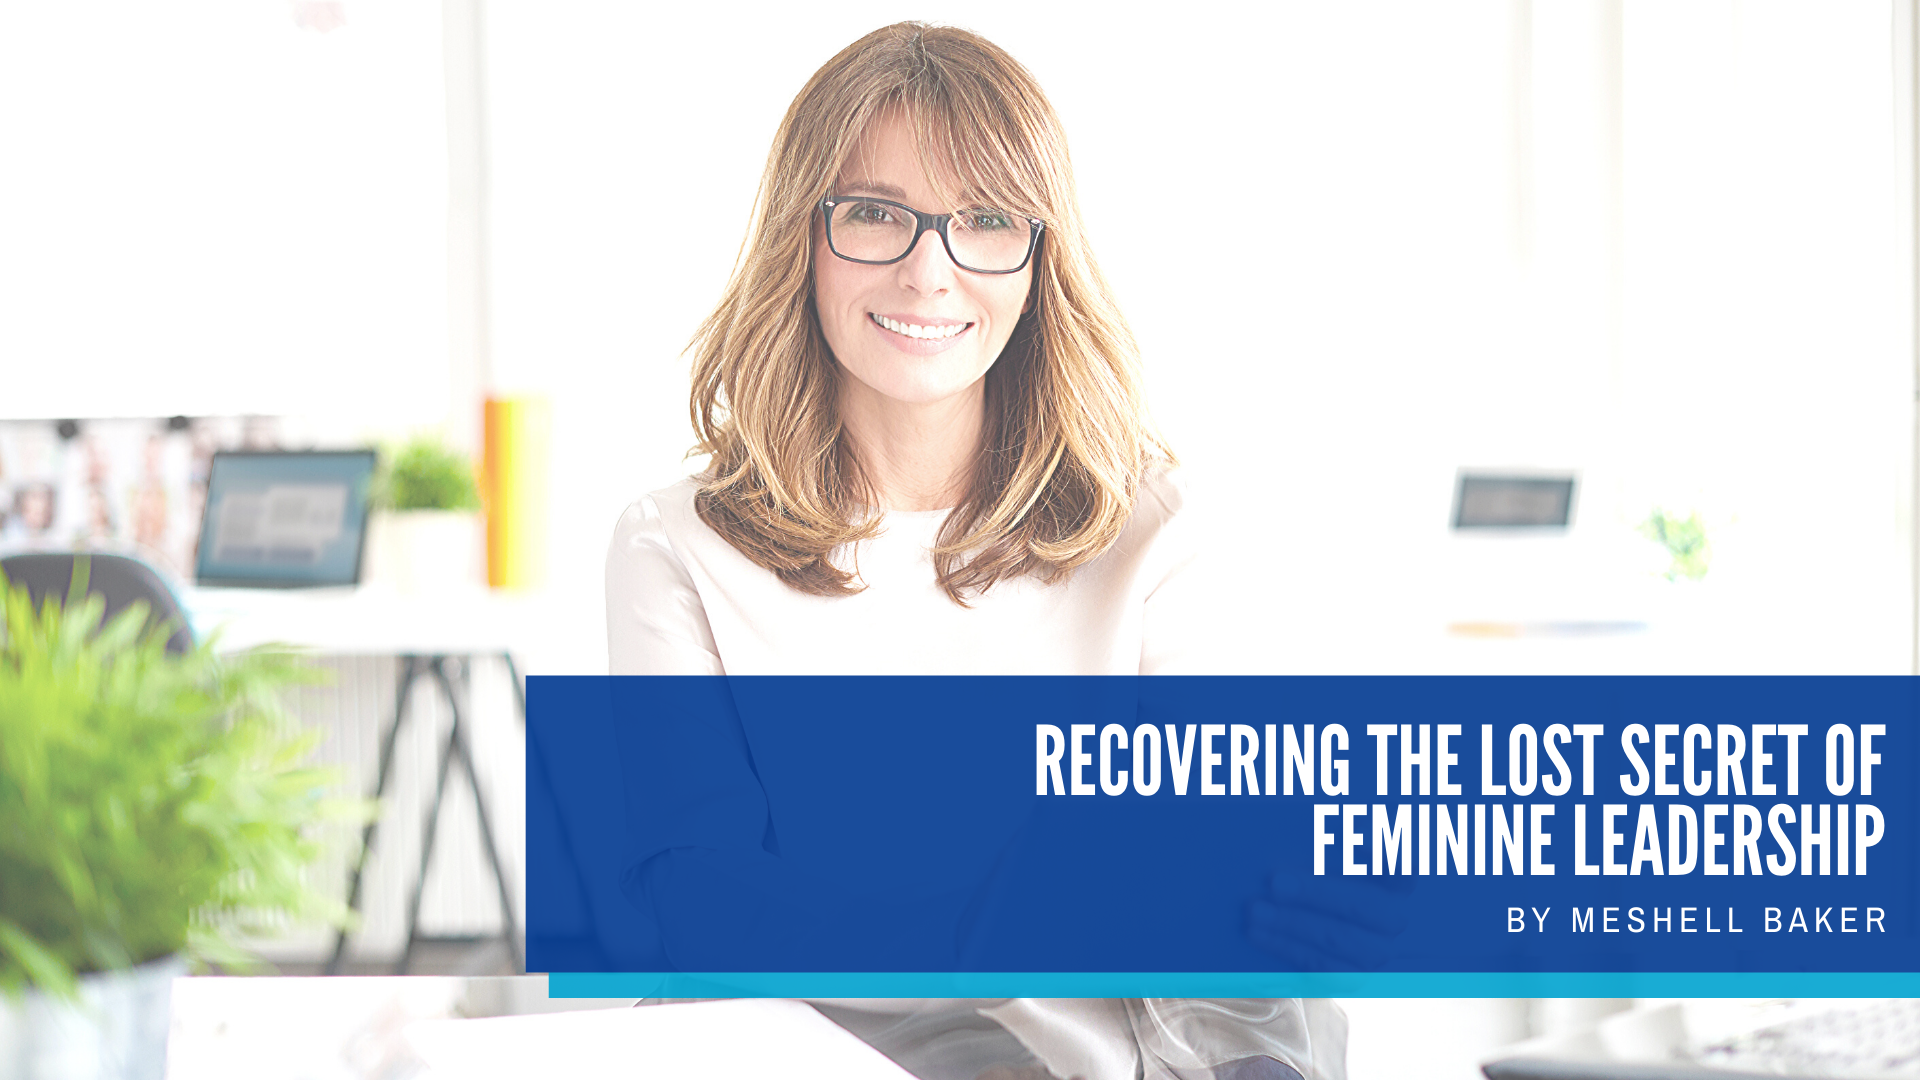 Recovering the Lost Secret of Feminine Leadership